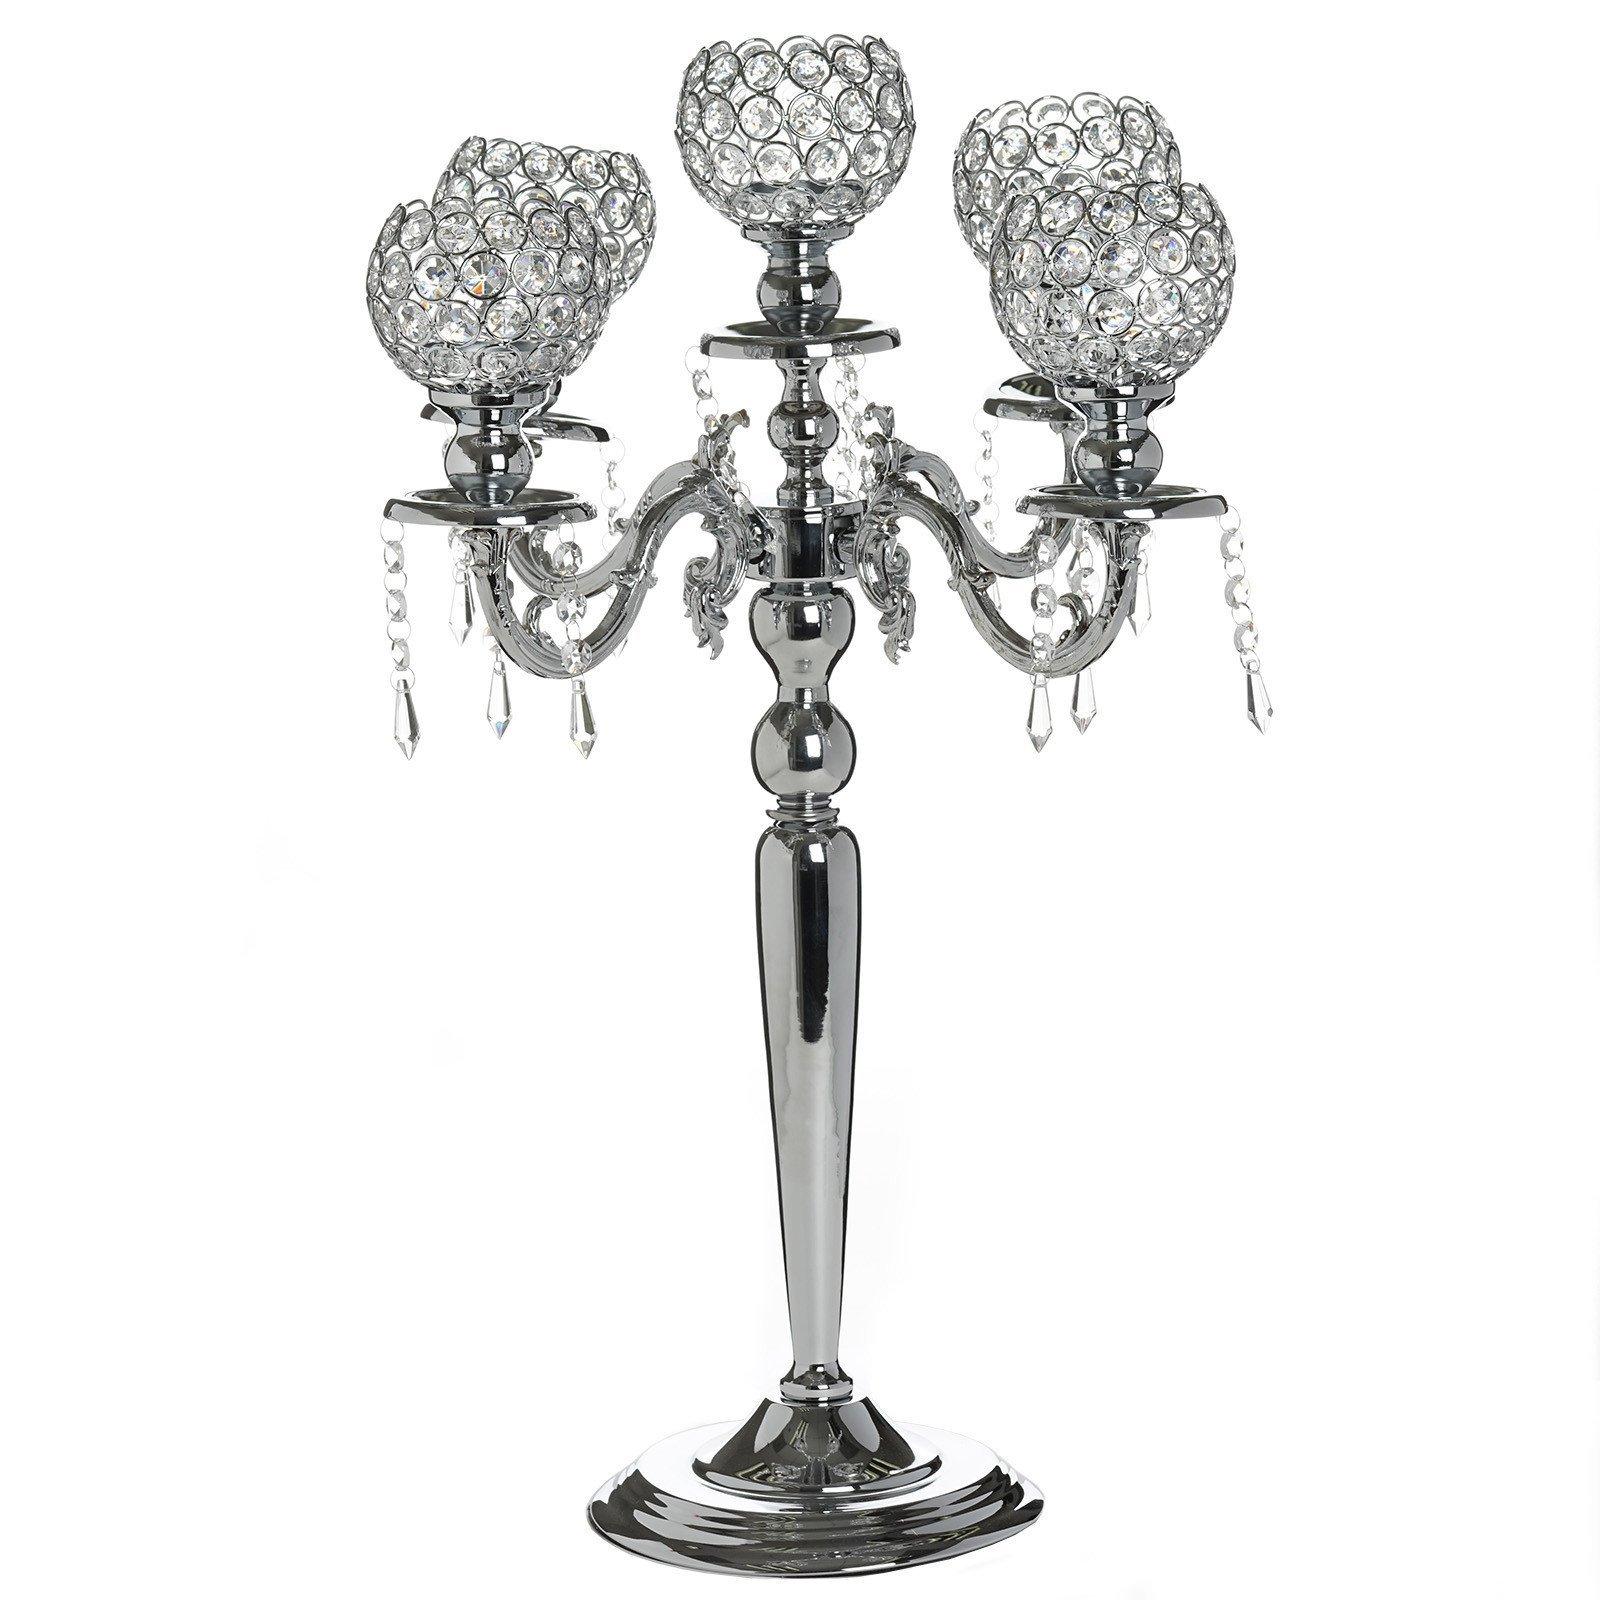 Candelabra Chandelier Crystal Votive Candle Holder Wedding Centerpiece 25 Tall Silver Crystal Votive Candle Holders Crystal Candle Holder Chandelier Candle Holder